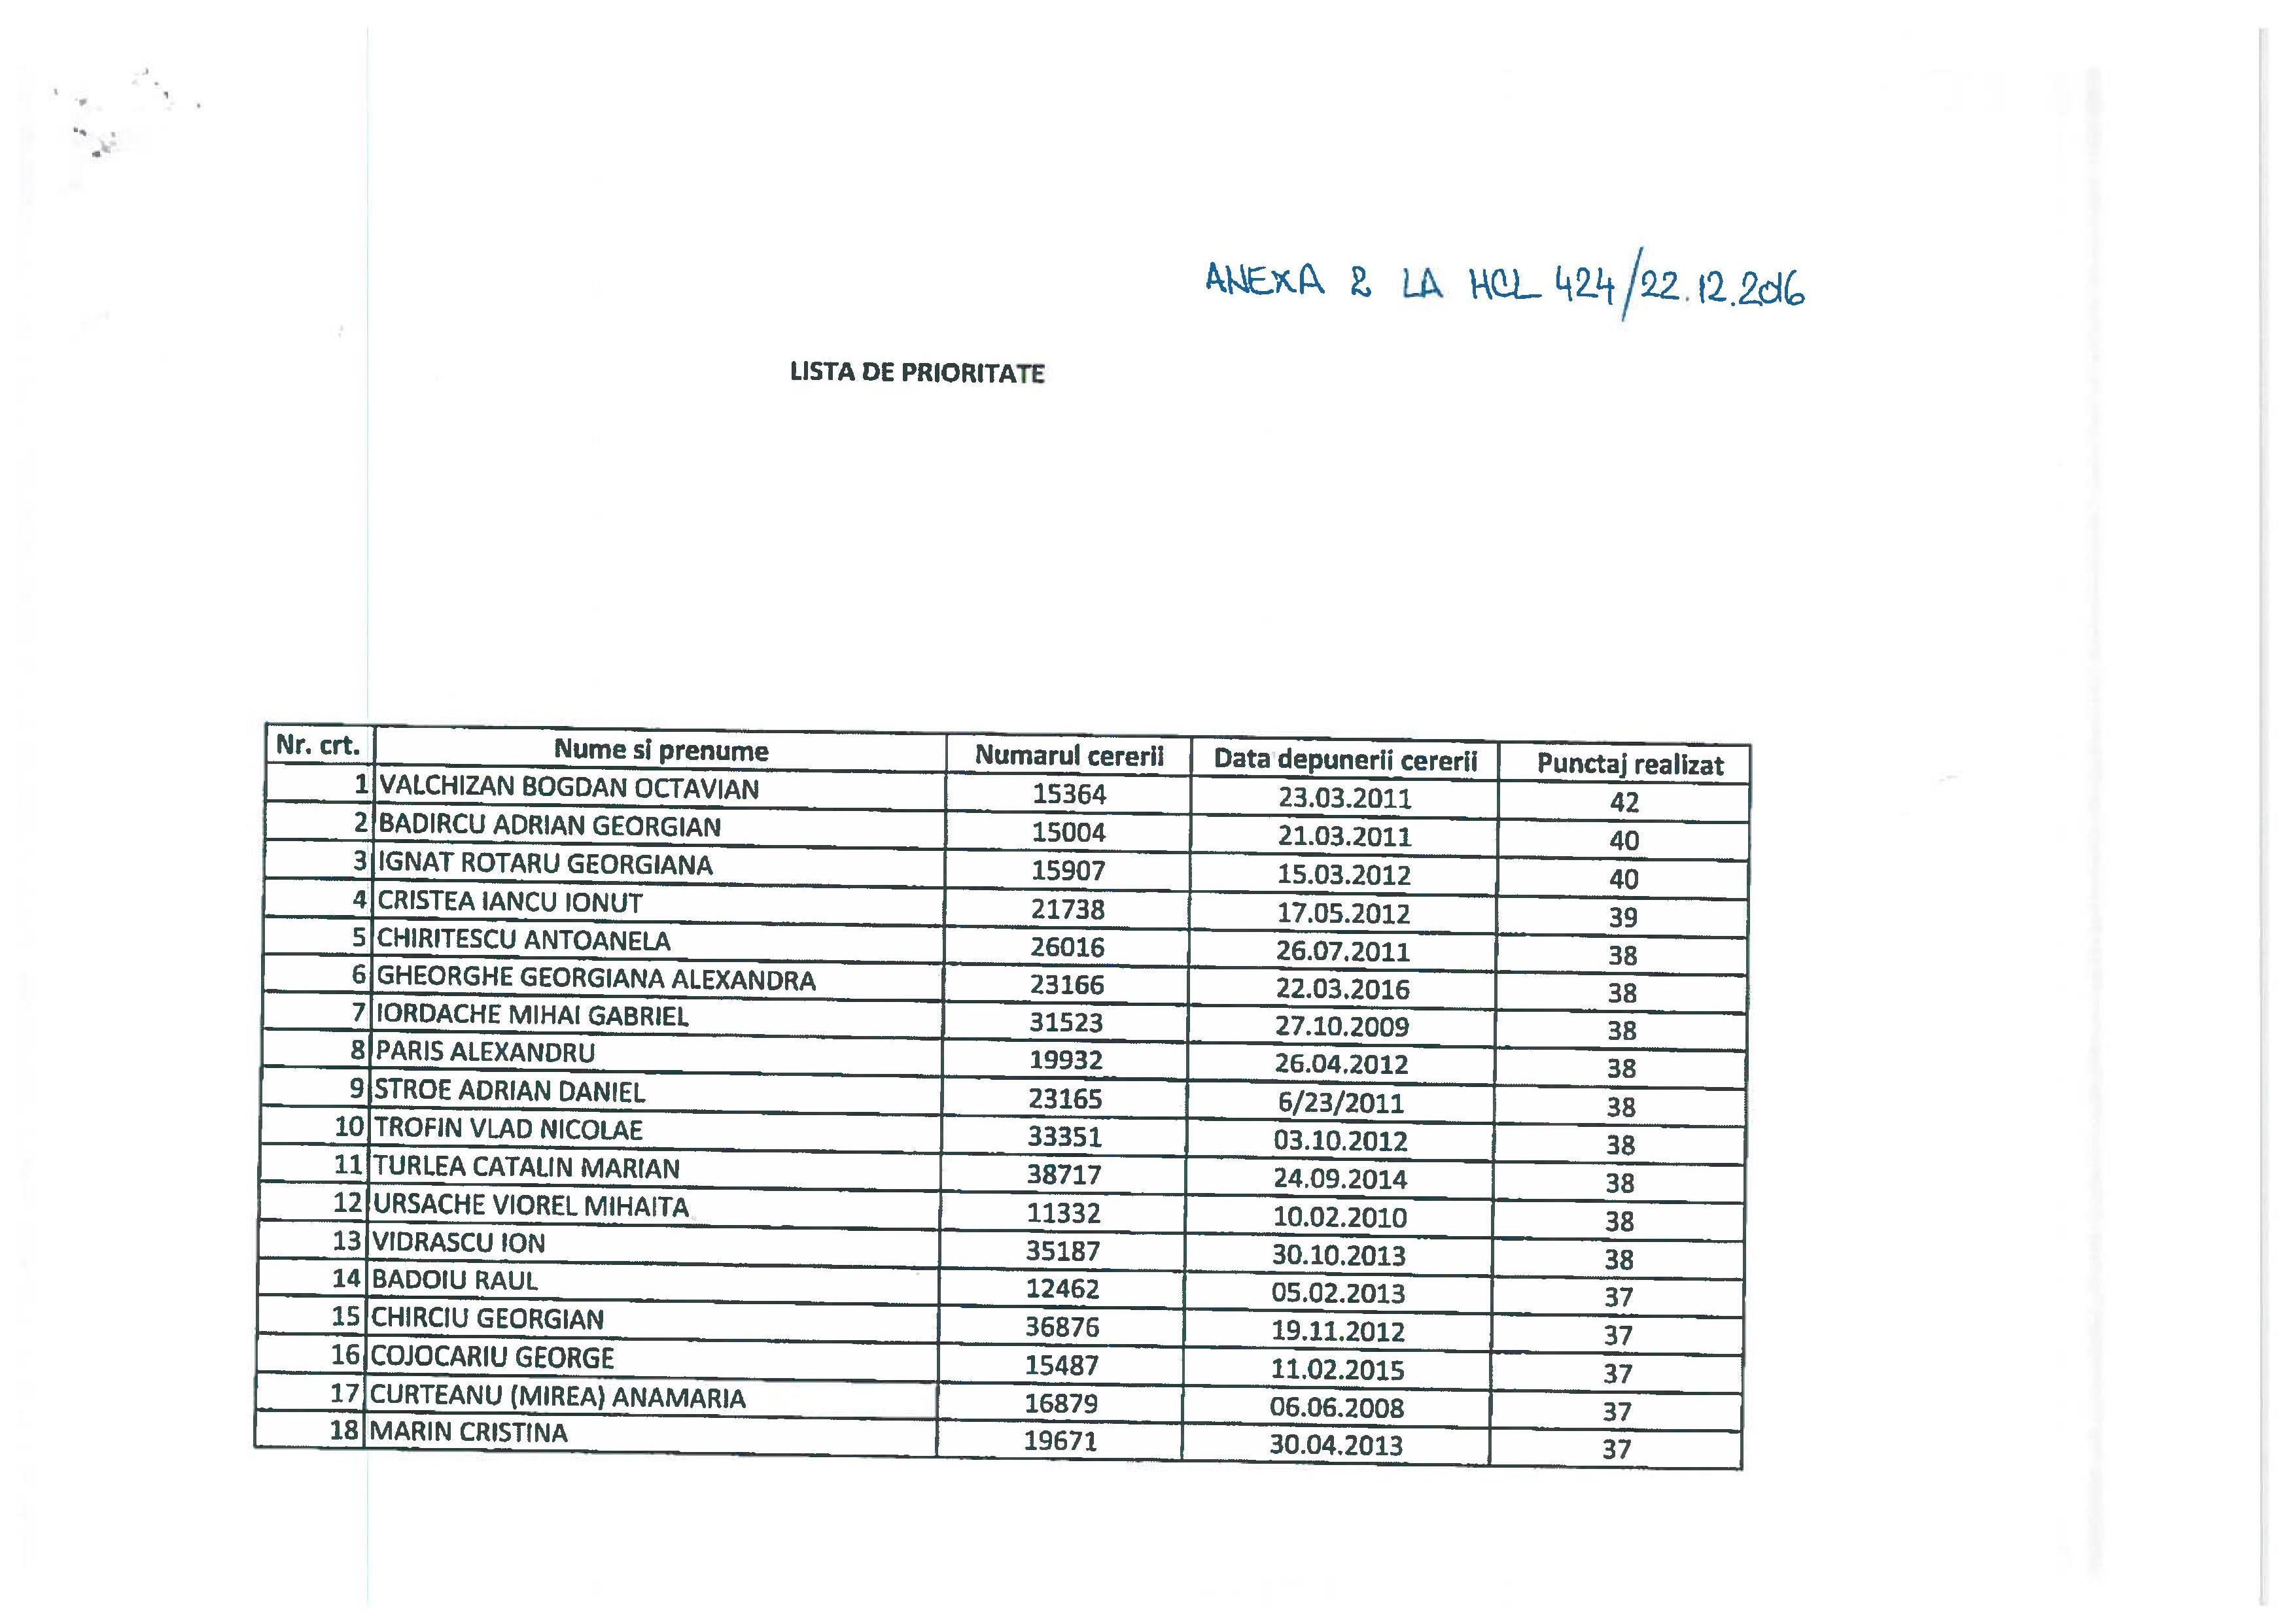 legea15-page-001